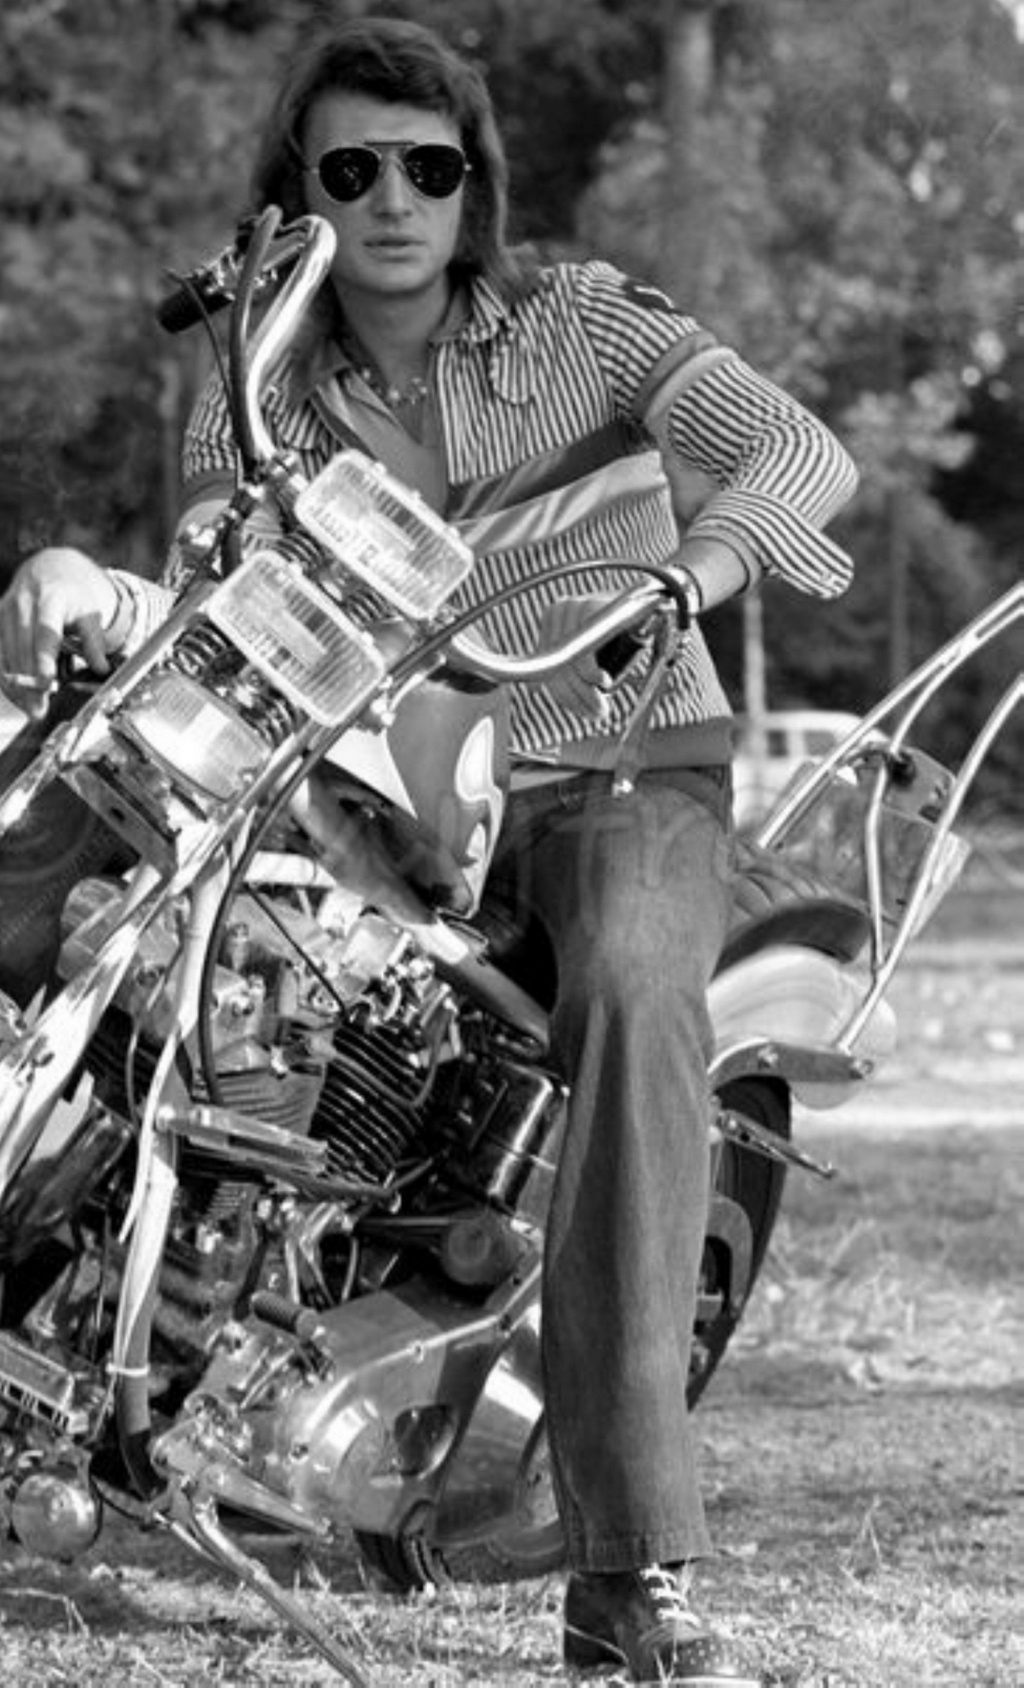 CHOPPER ( MOTEUR HARLEY SHOVELHEAD ) DE JOHNNY HALLYDAY ( 1971 ) Pict_m23